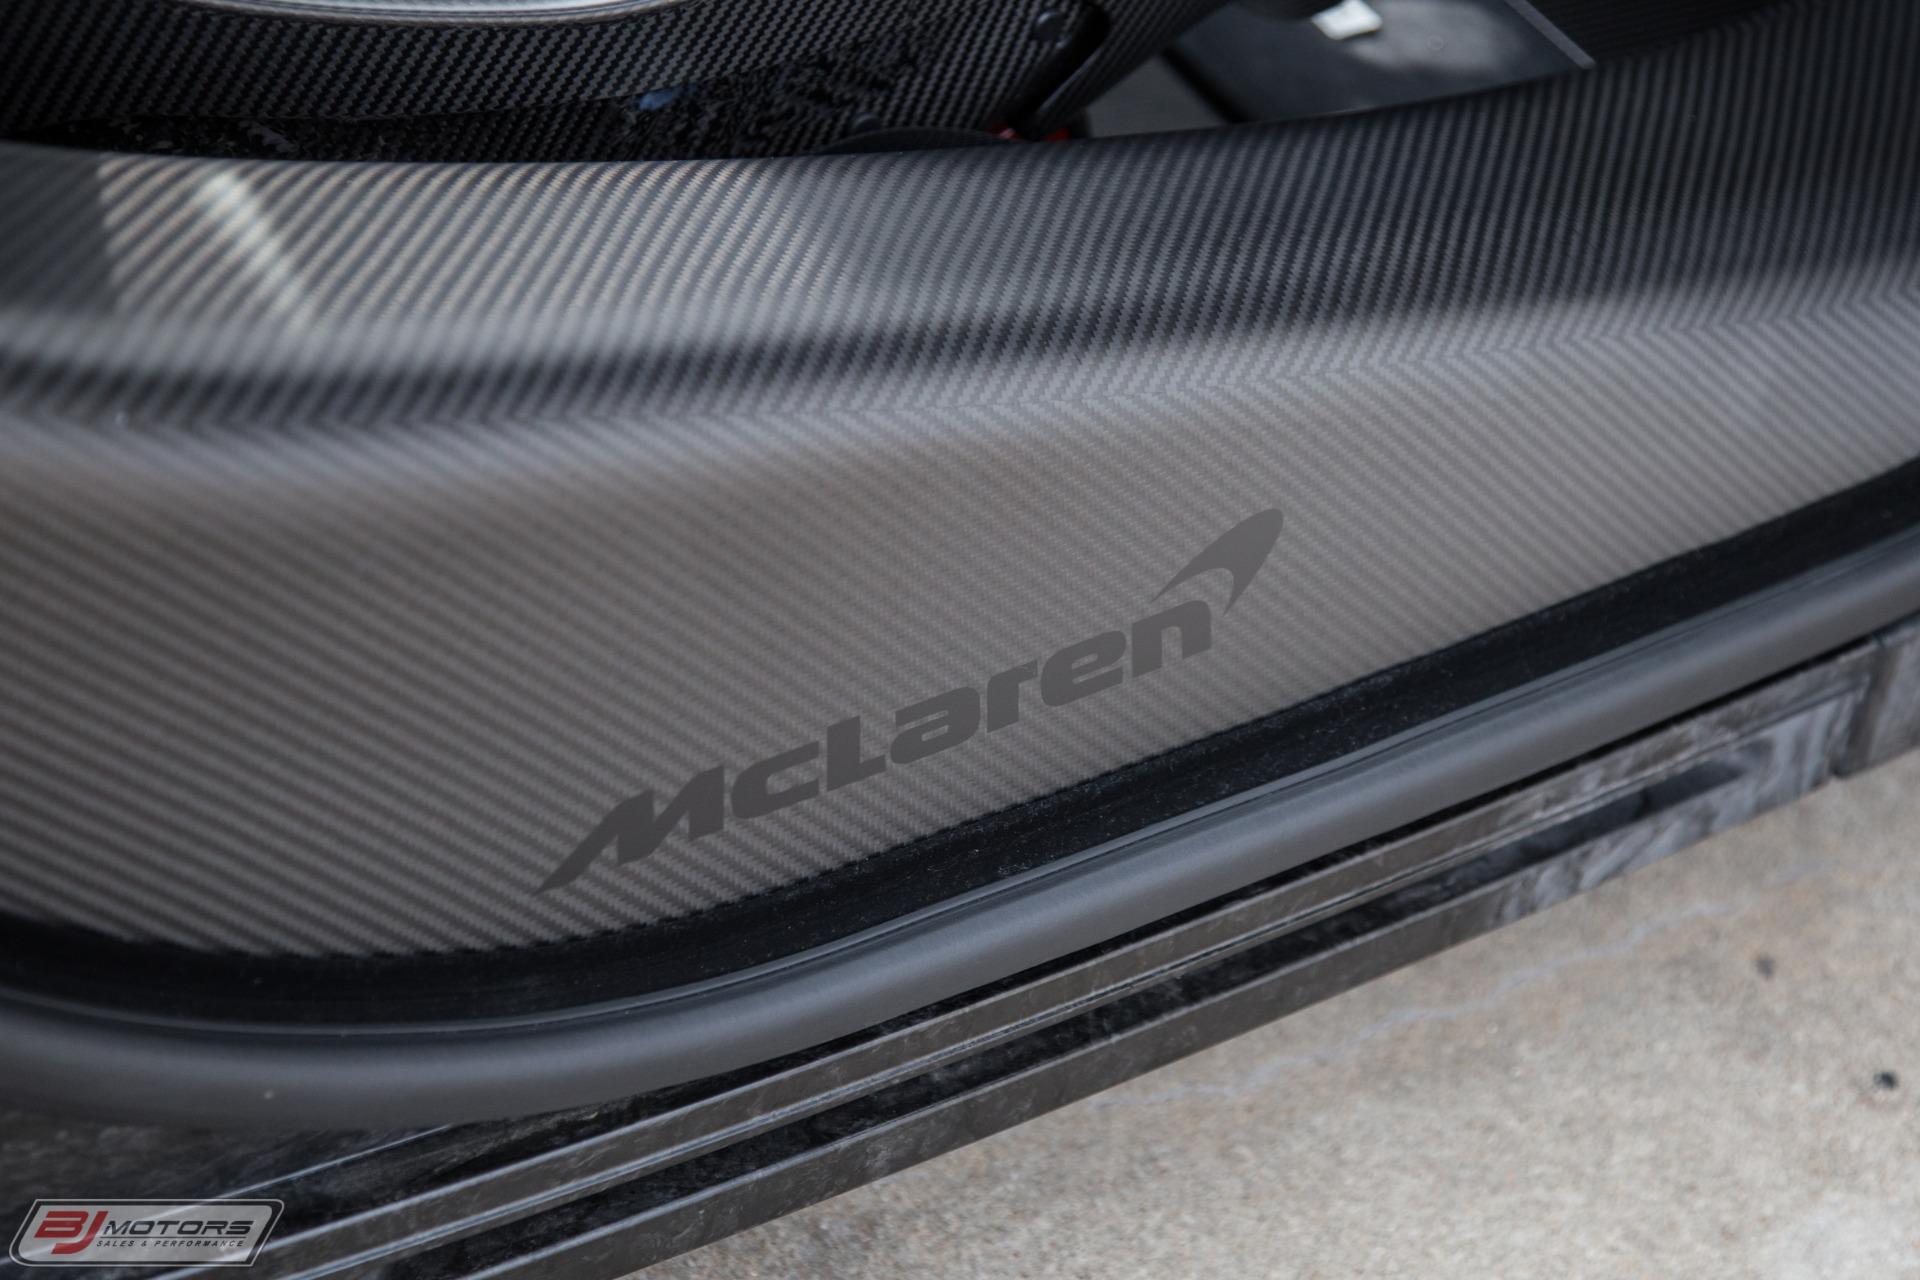 Used-2019-McLaren-Senna-MSO-Bespoke-Jet-Black-Paint